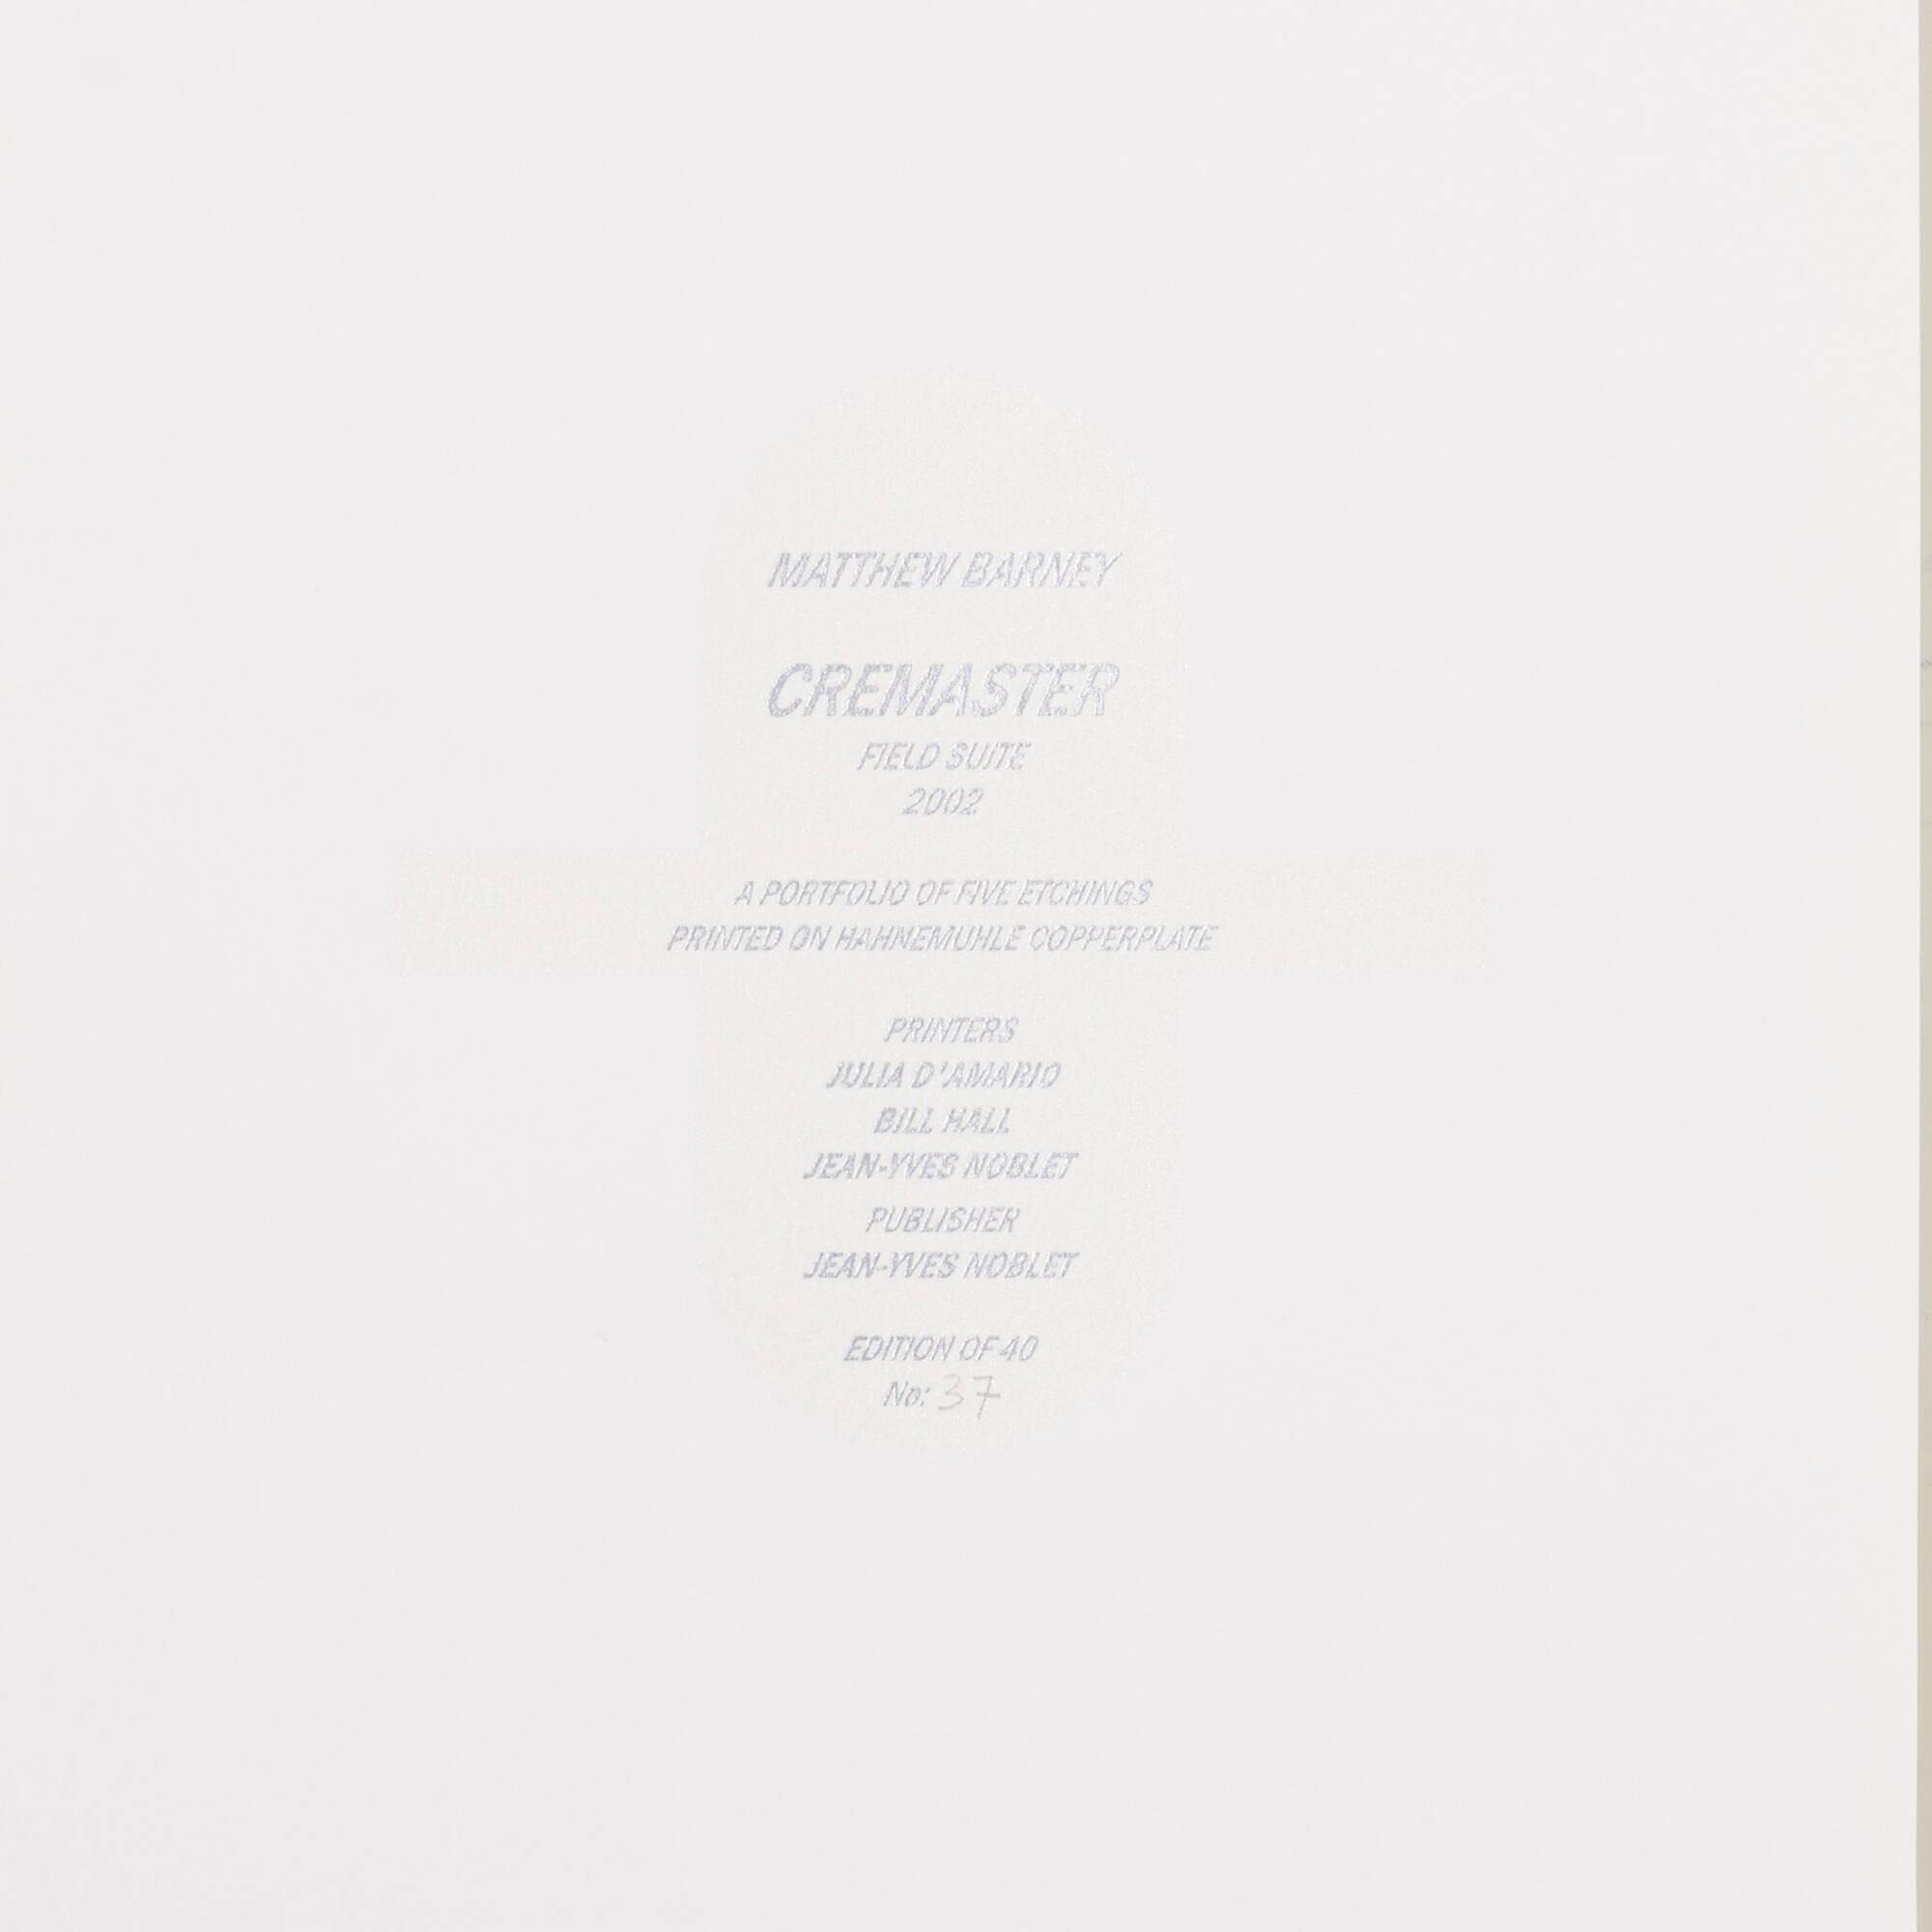 150: Matthew Barney / Cremaster: Field Suite (portfolio of five works) (2 of 3)